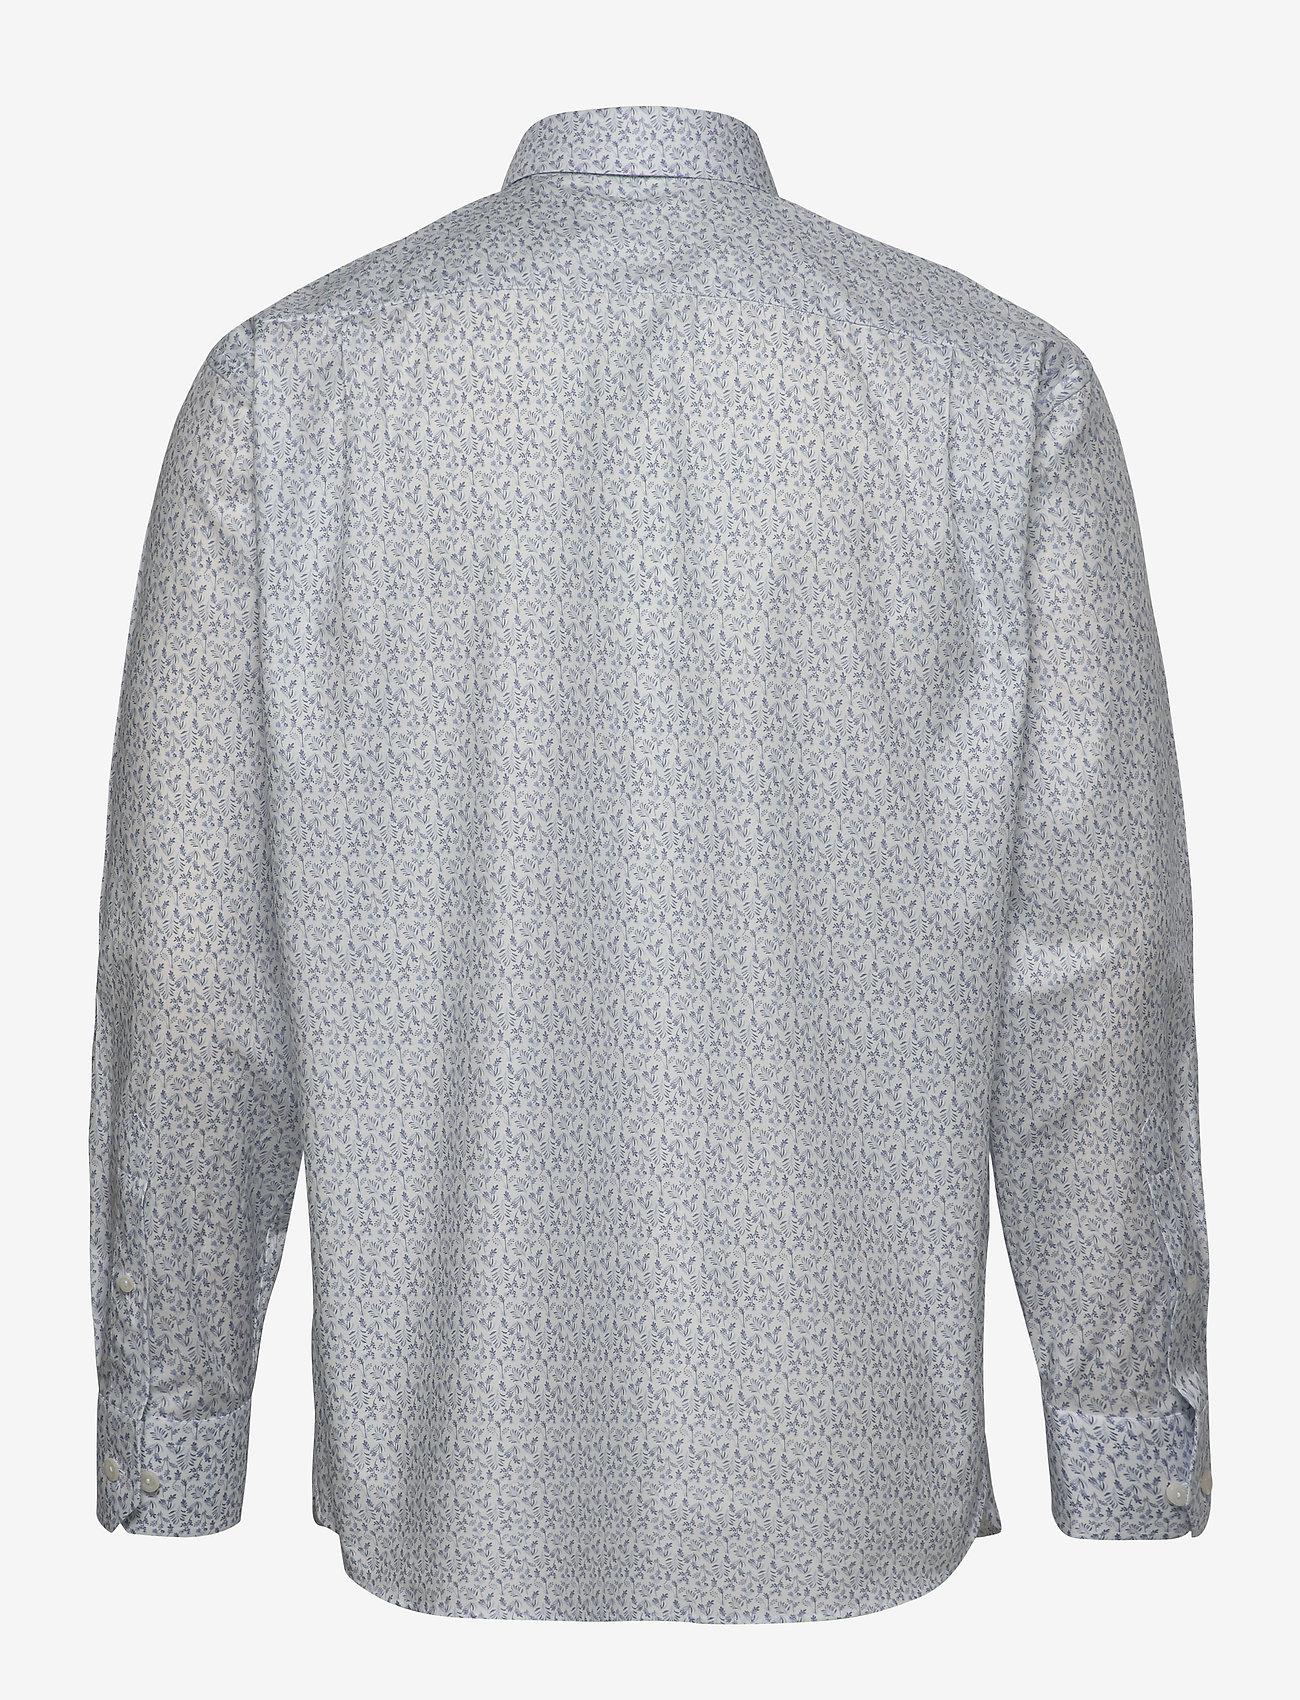 White Flannel Floral Print Shirt (White) - Eton XjOhsG